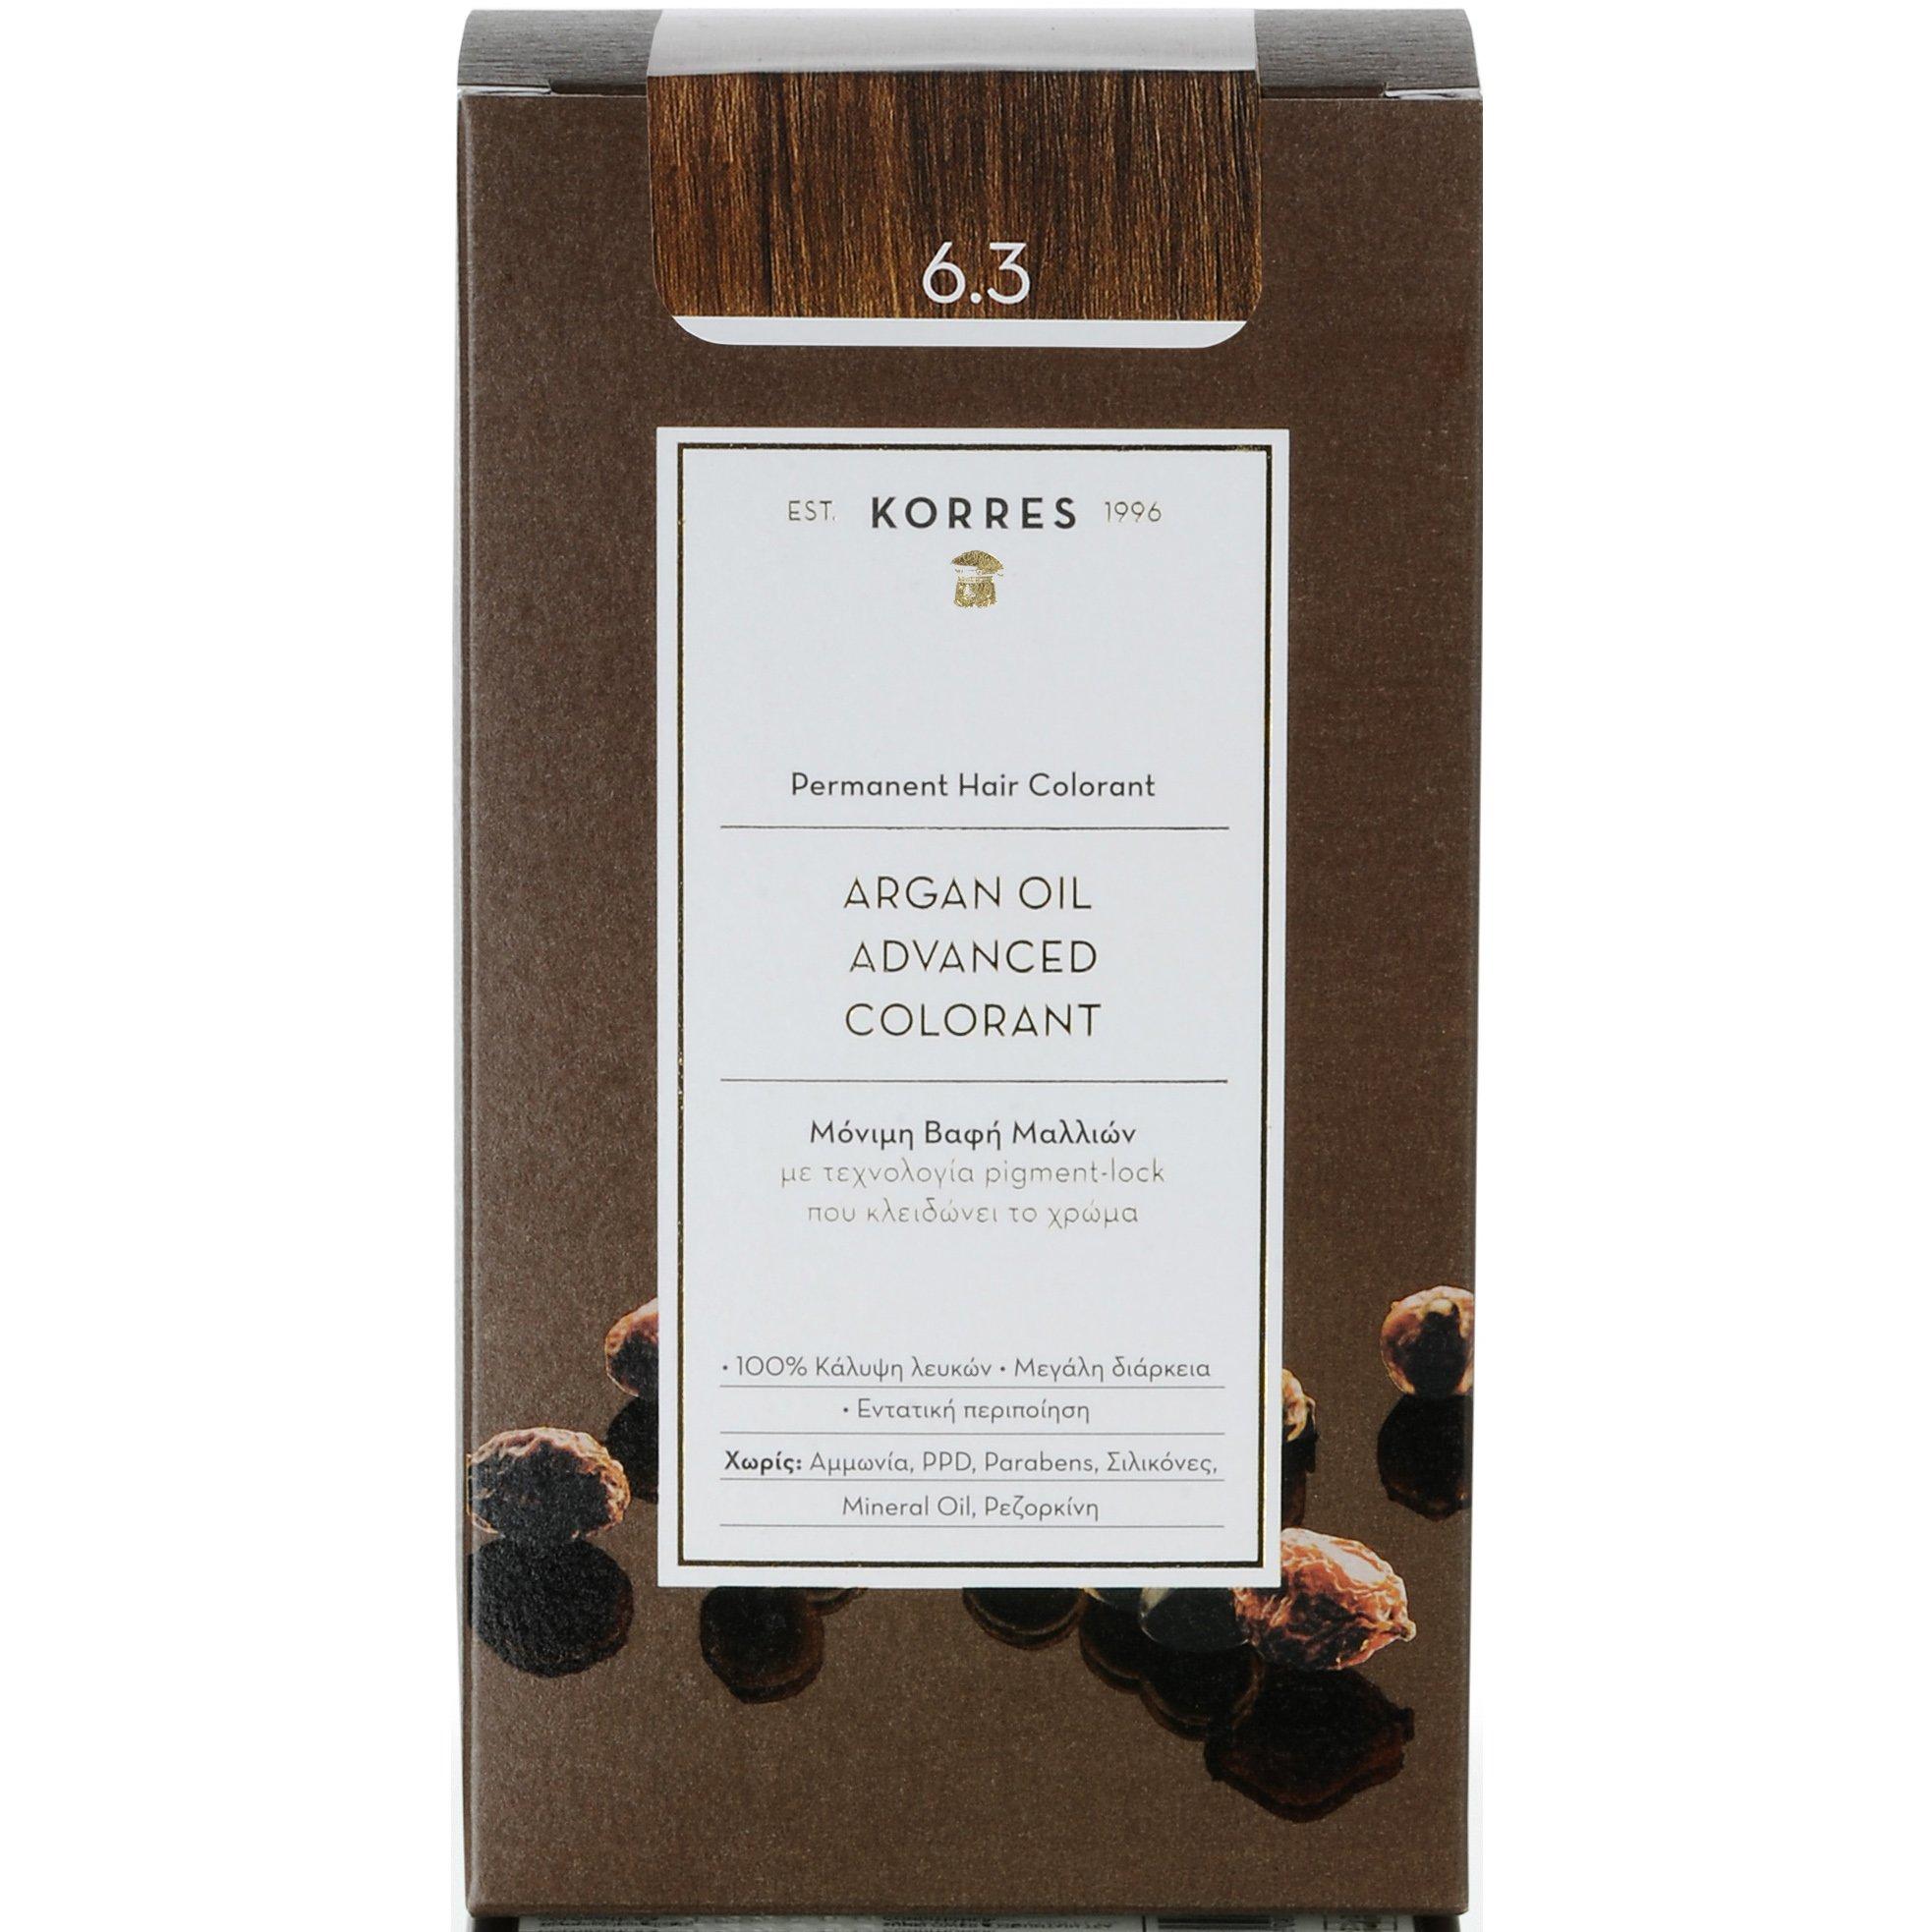 Korres Argan Oil Advanced Colorant Μόνιμη Βαφή Μαλλιών με Τεχνολογία Pigment-Lock που Κλειδώνει το Χρώμα 50ml – 6.3 ΞΑΝΘΟ ΣΚΟΥΡΟ ΜΕΛΙ